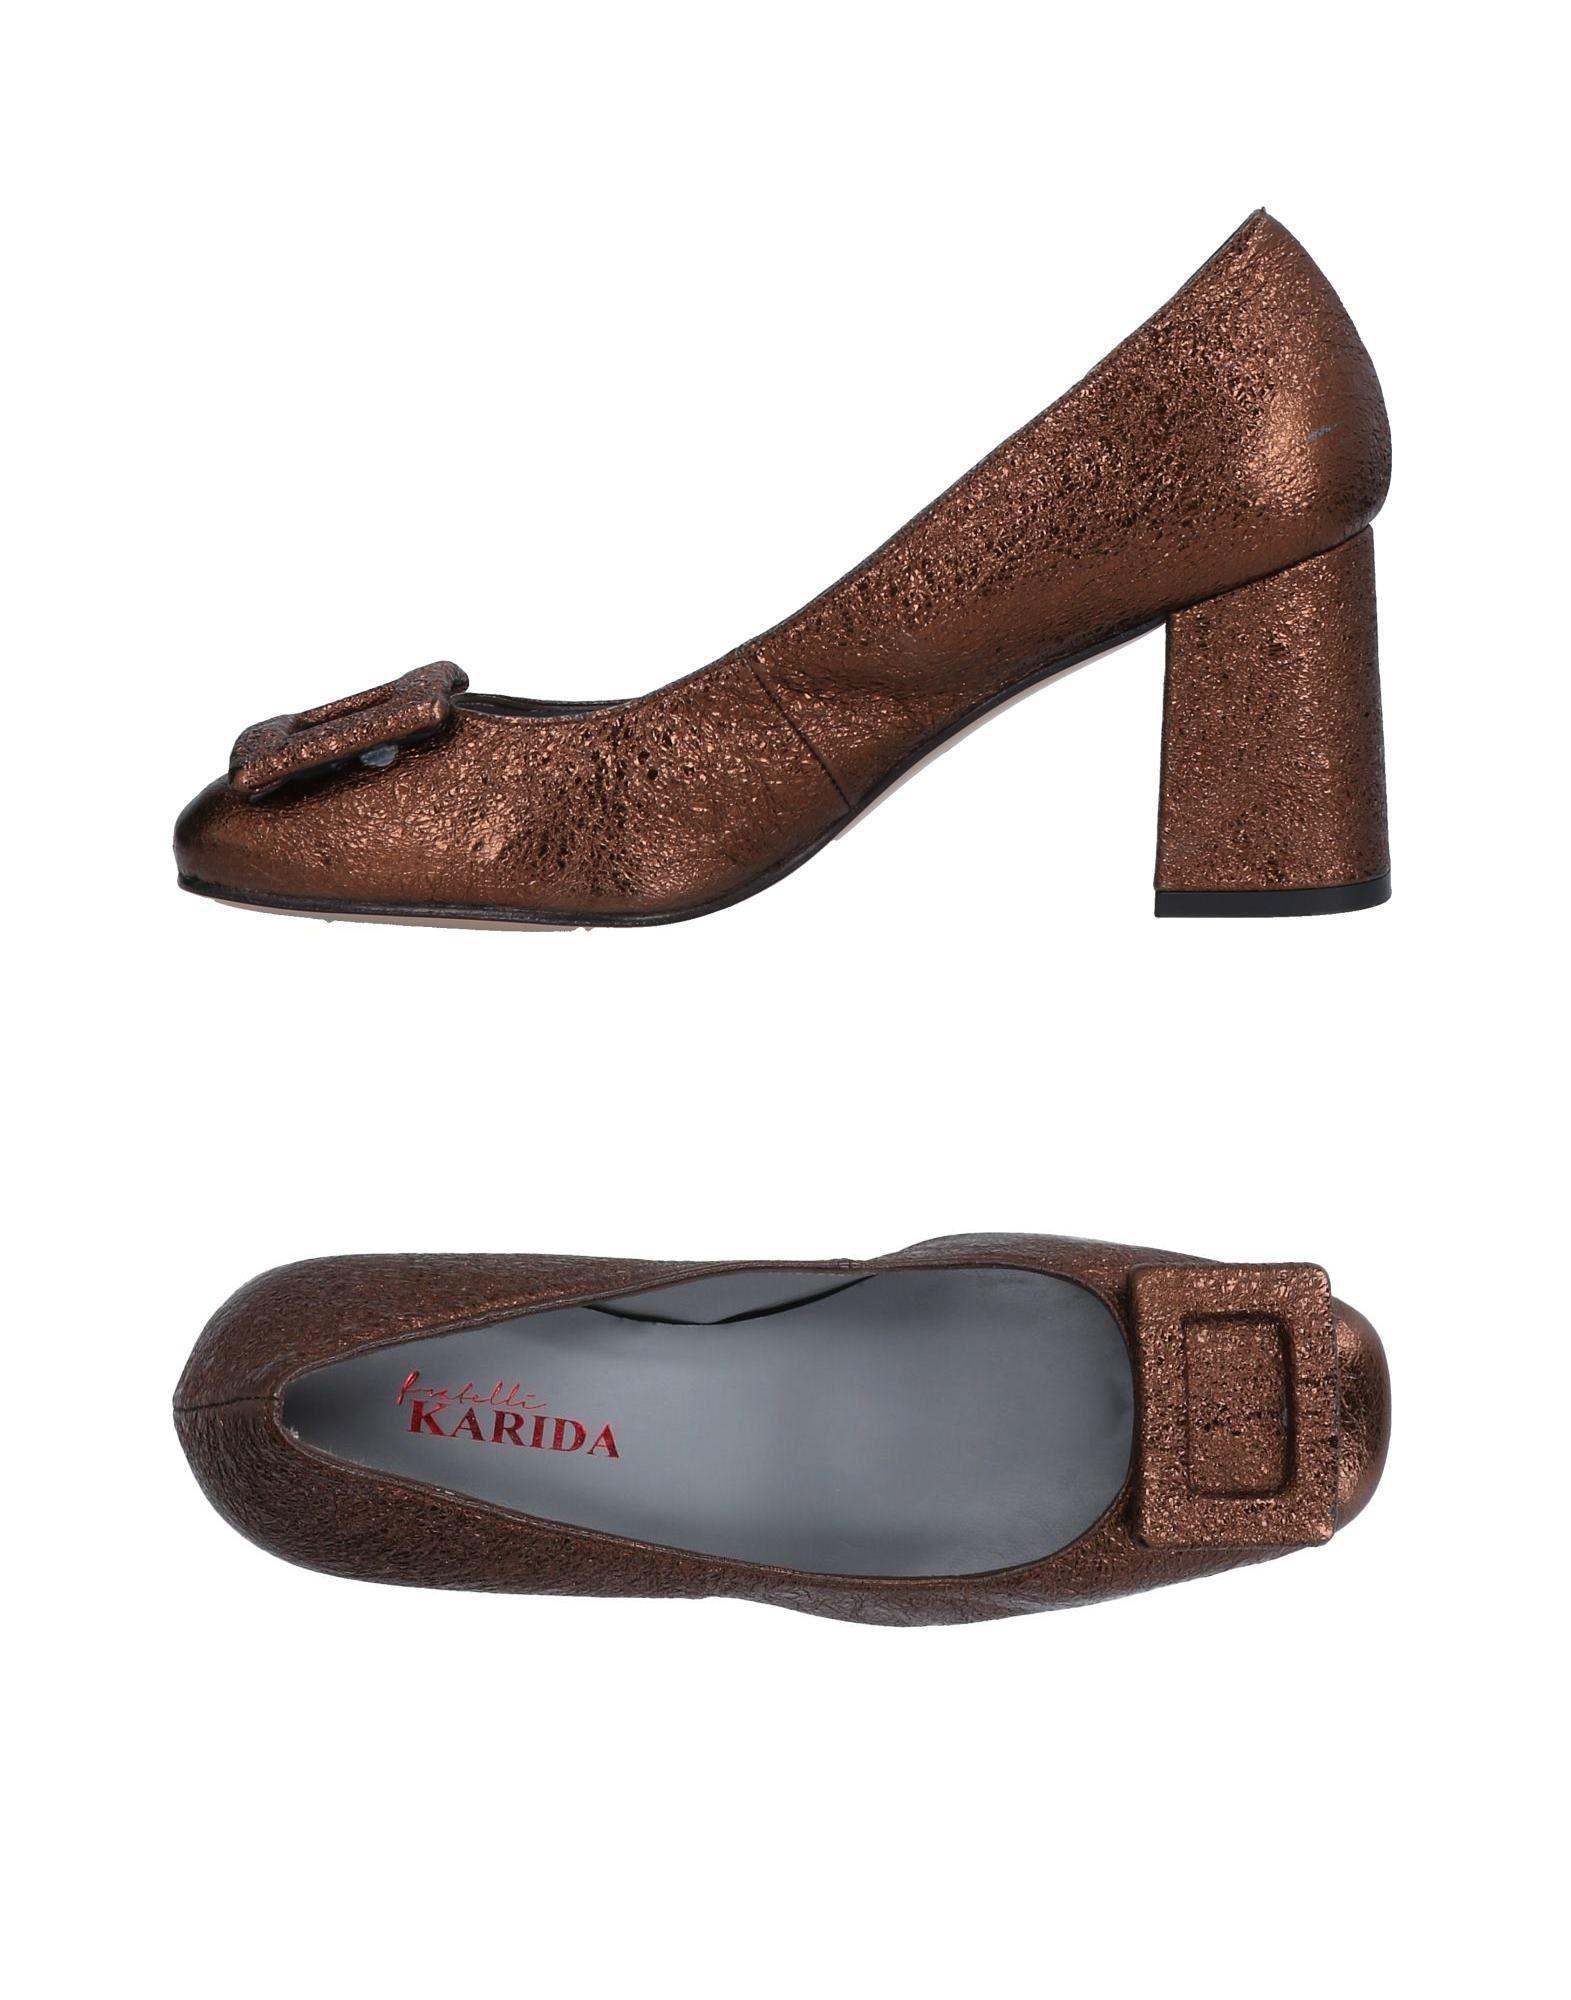 Fratelli Karida Pumps Damen  11503044LQ Gute Qualität beliebte Schuhe